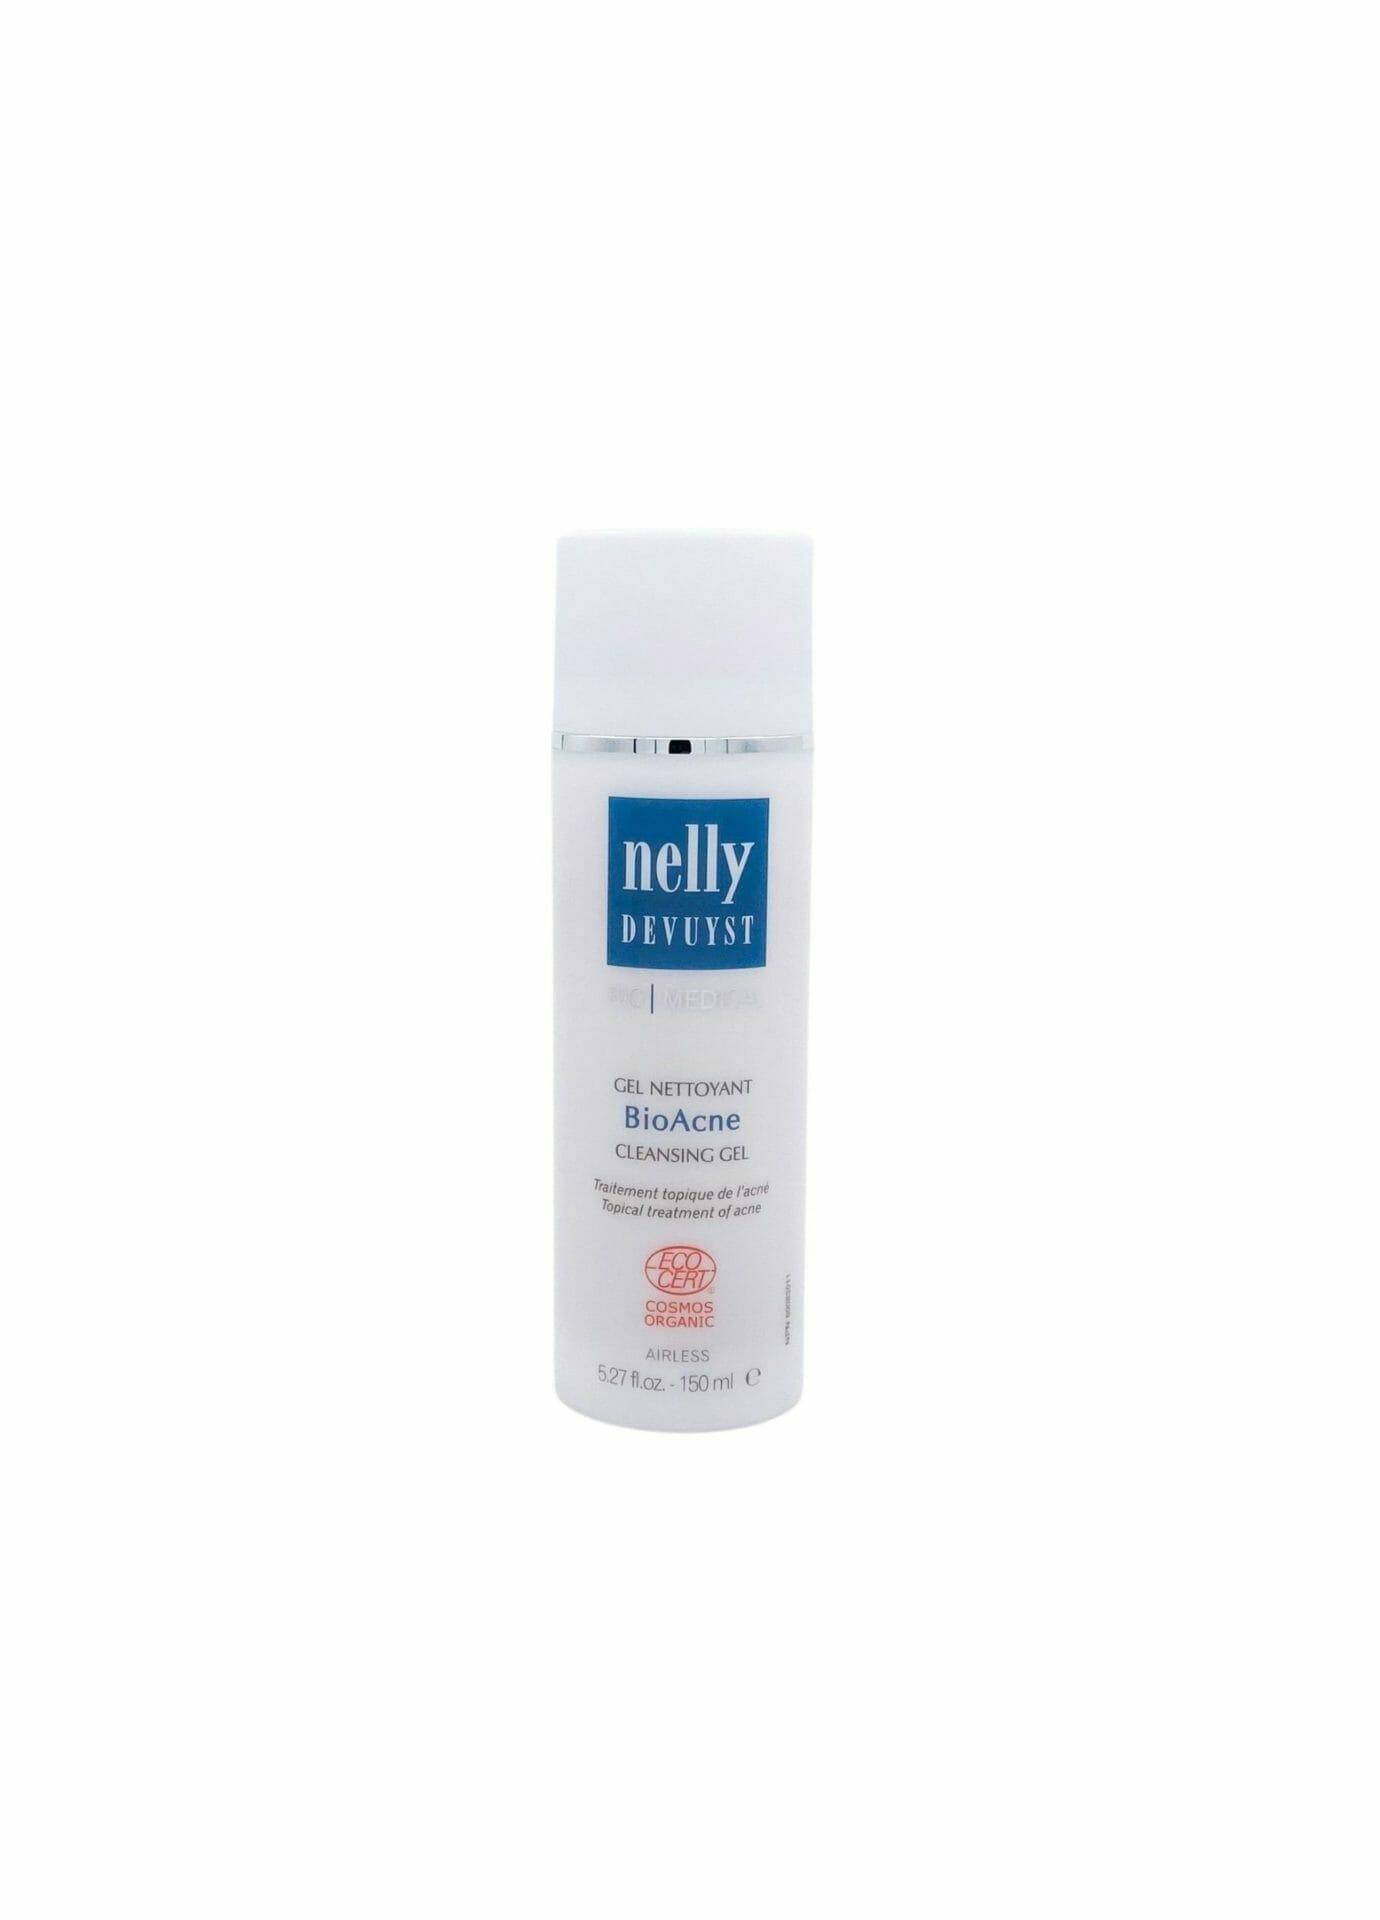 Nelly De Vuyst BioAcne Cleansing gel